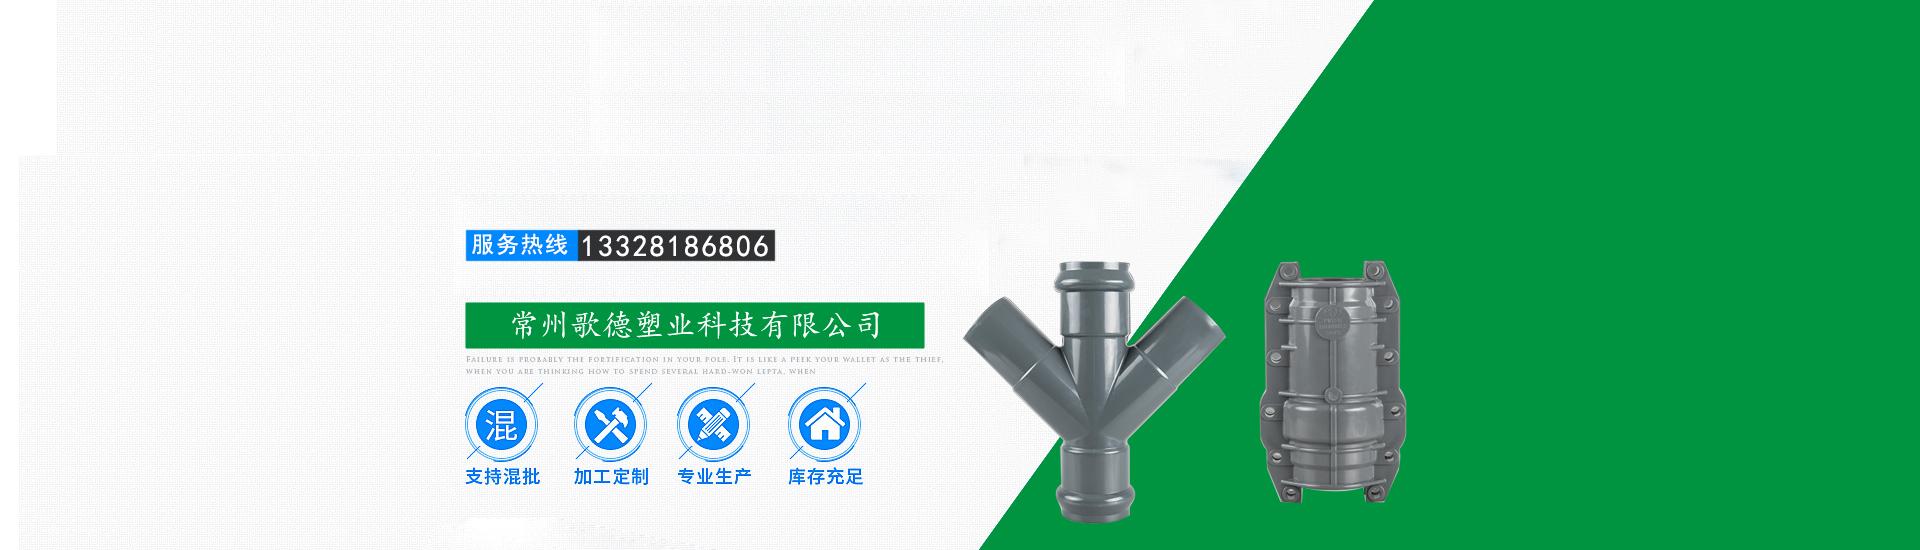 pvc-u化工管材产品图片